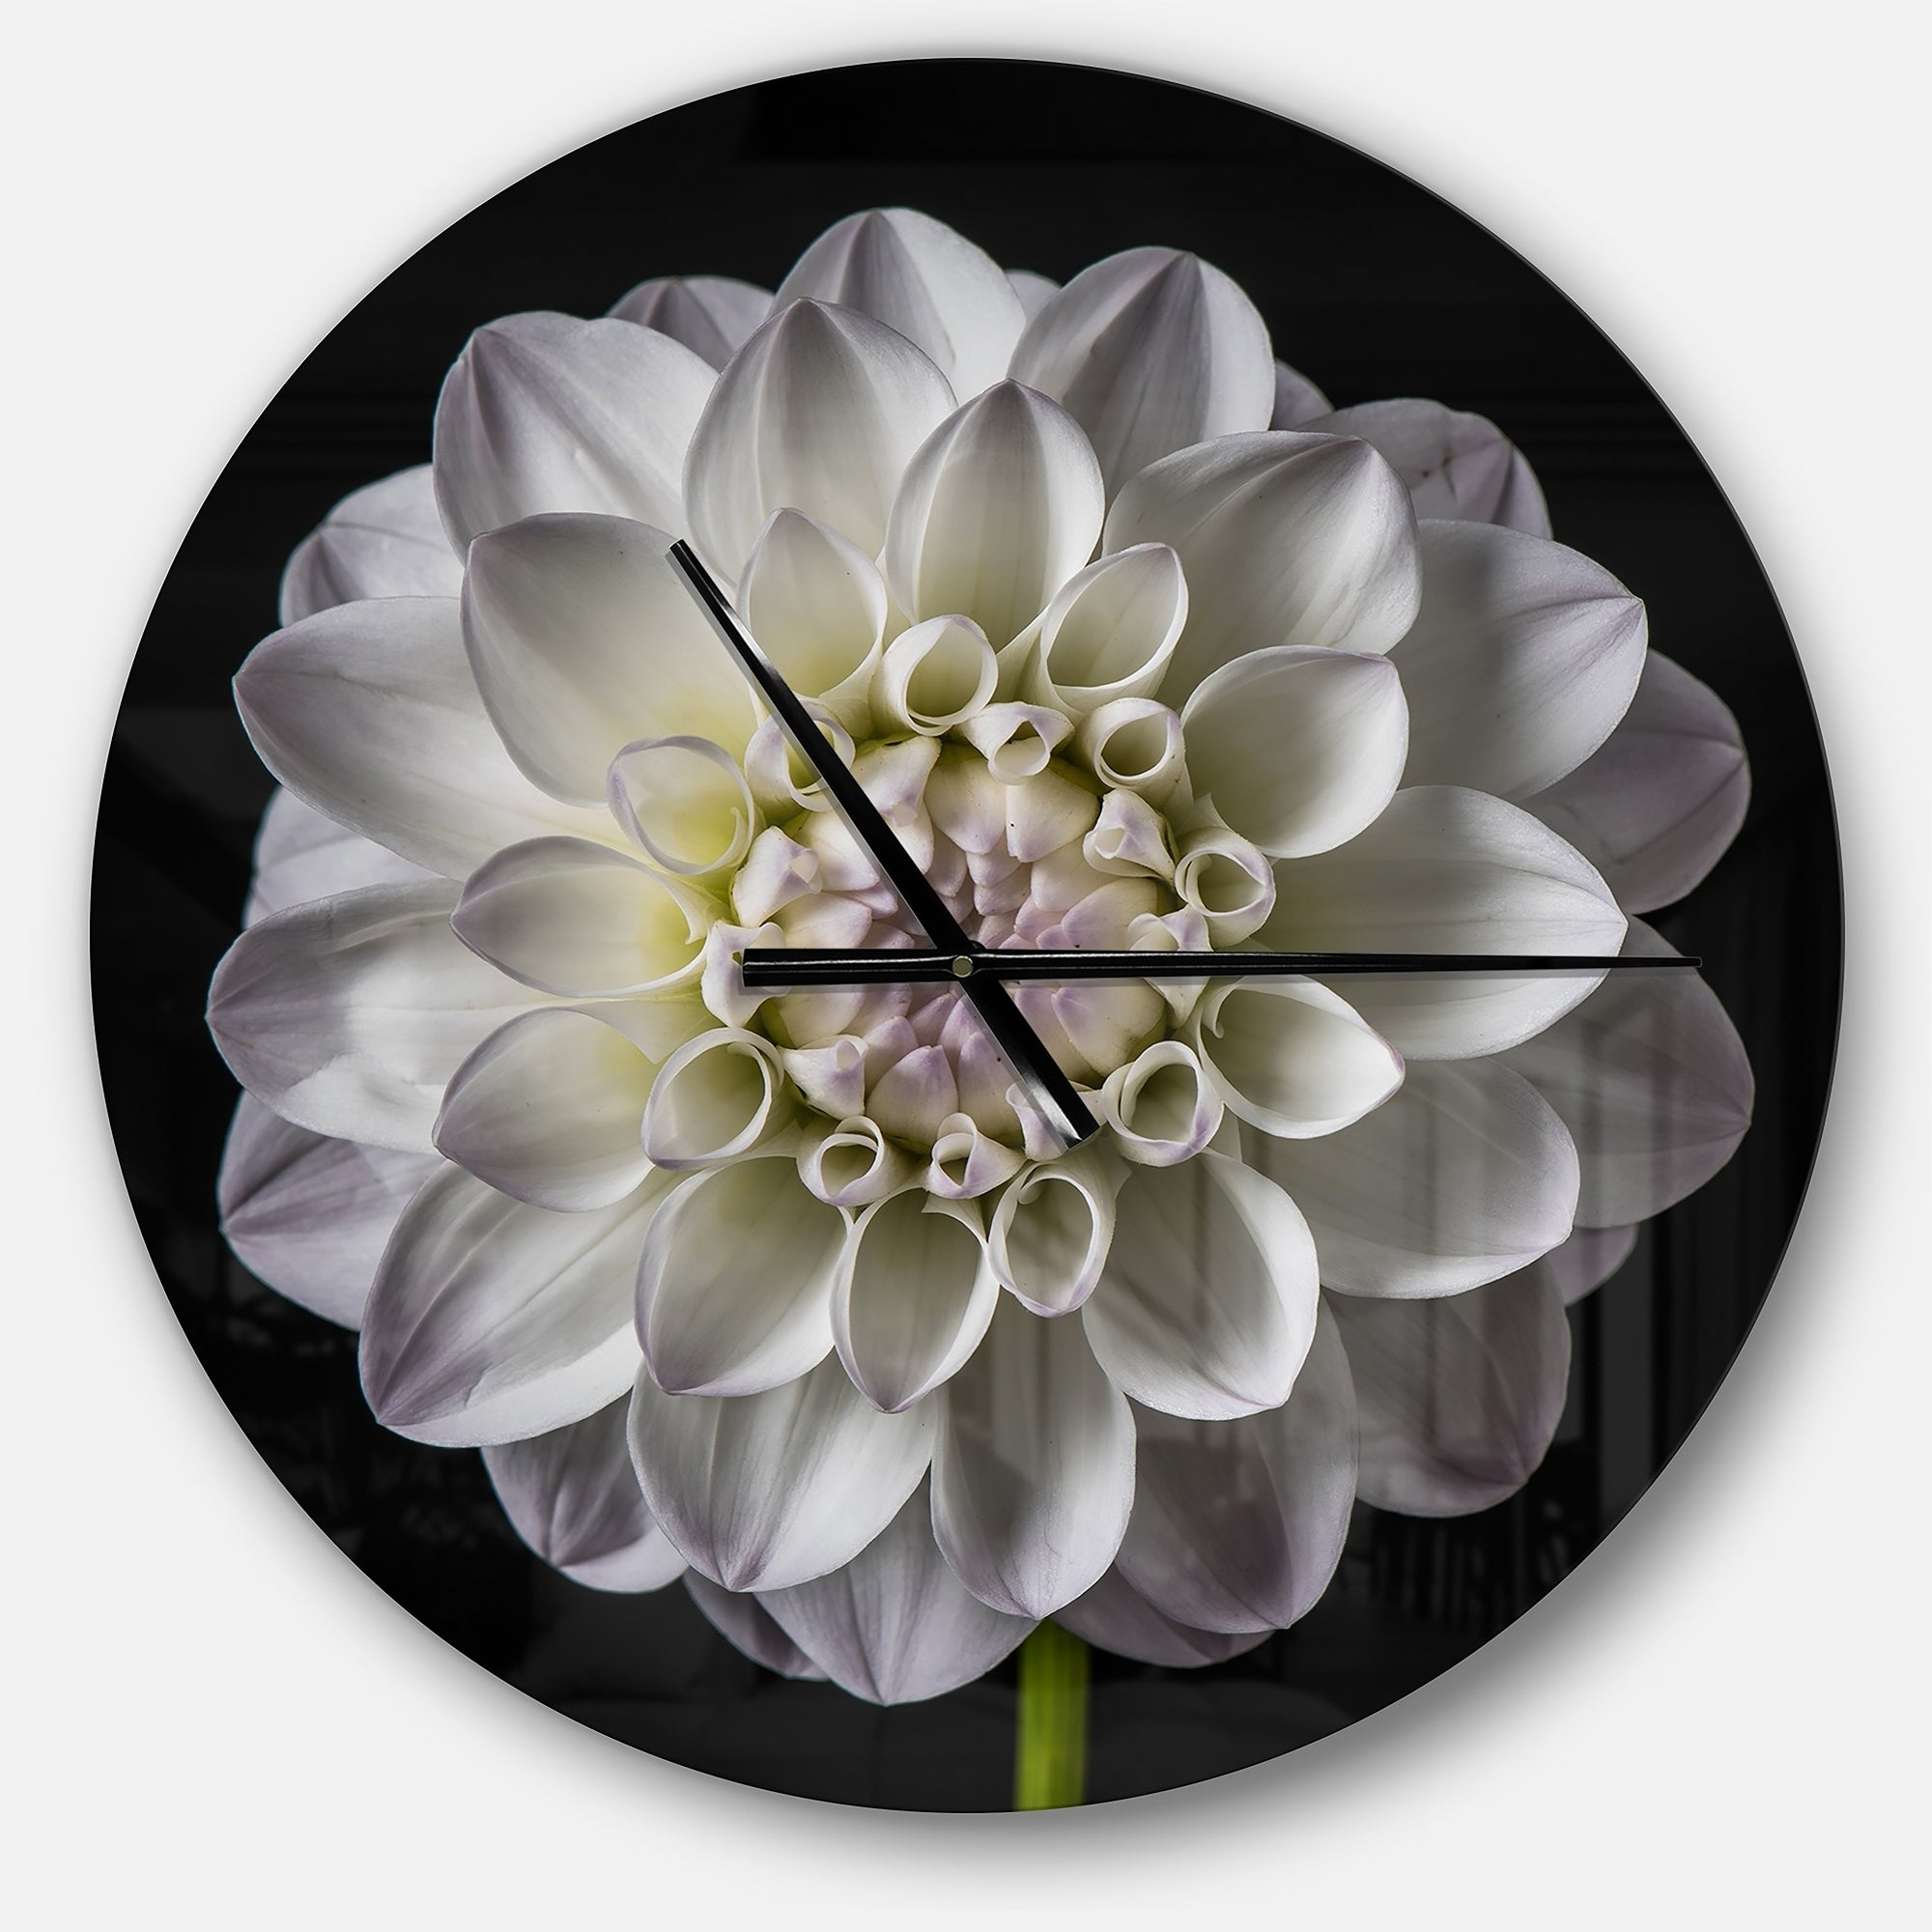 Shop designart isolated dahlia flower in black oversized floral shop designart isolated dahlia flower in black oversized floral metal clock free shipping today overstock 23534802 izmirmasajfo